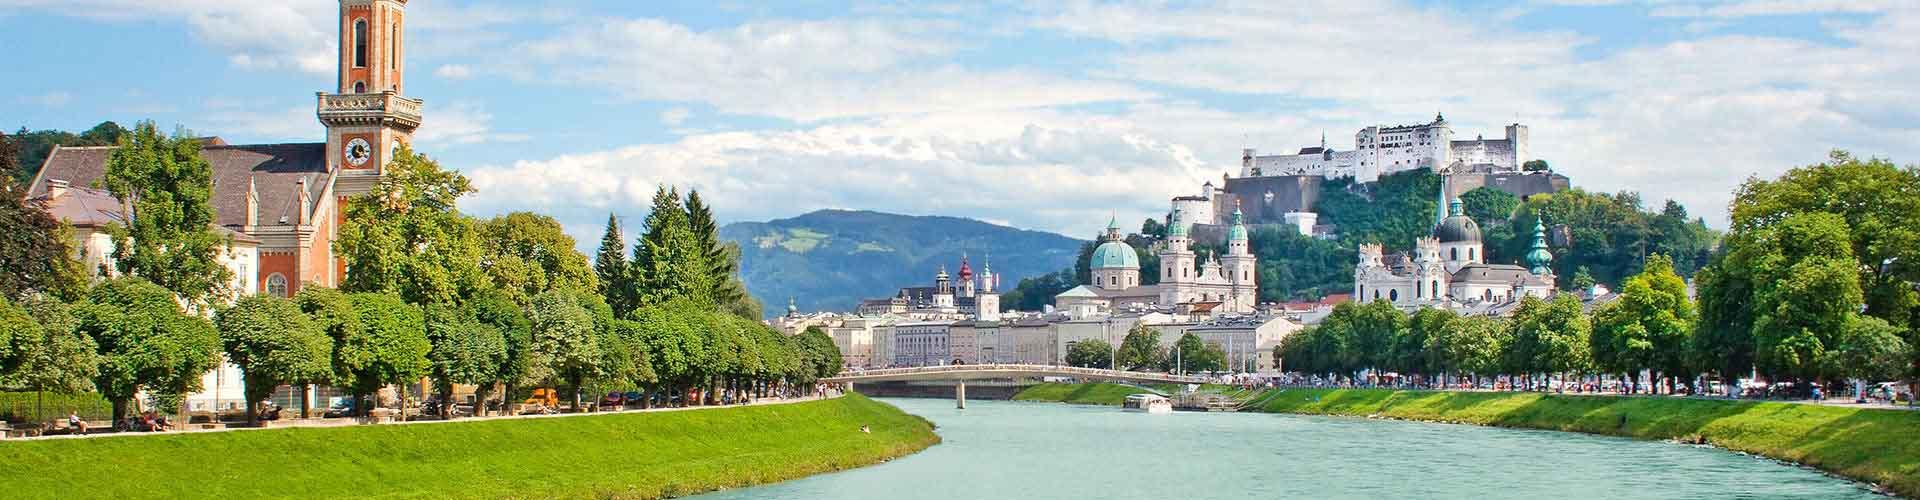 Salzburgo - Apartamentos en Salzburgo. Mapas de Salzburgo, Fotos y comentarios de cada Apartamento en Salzburgo.